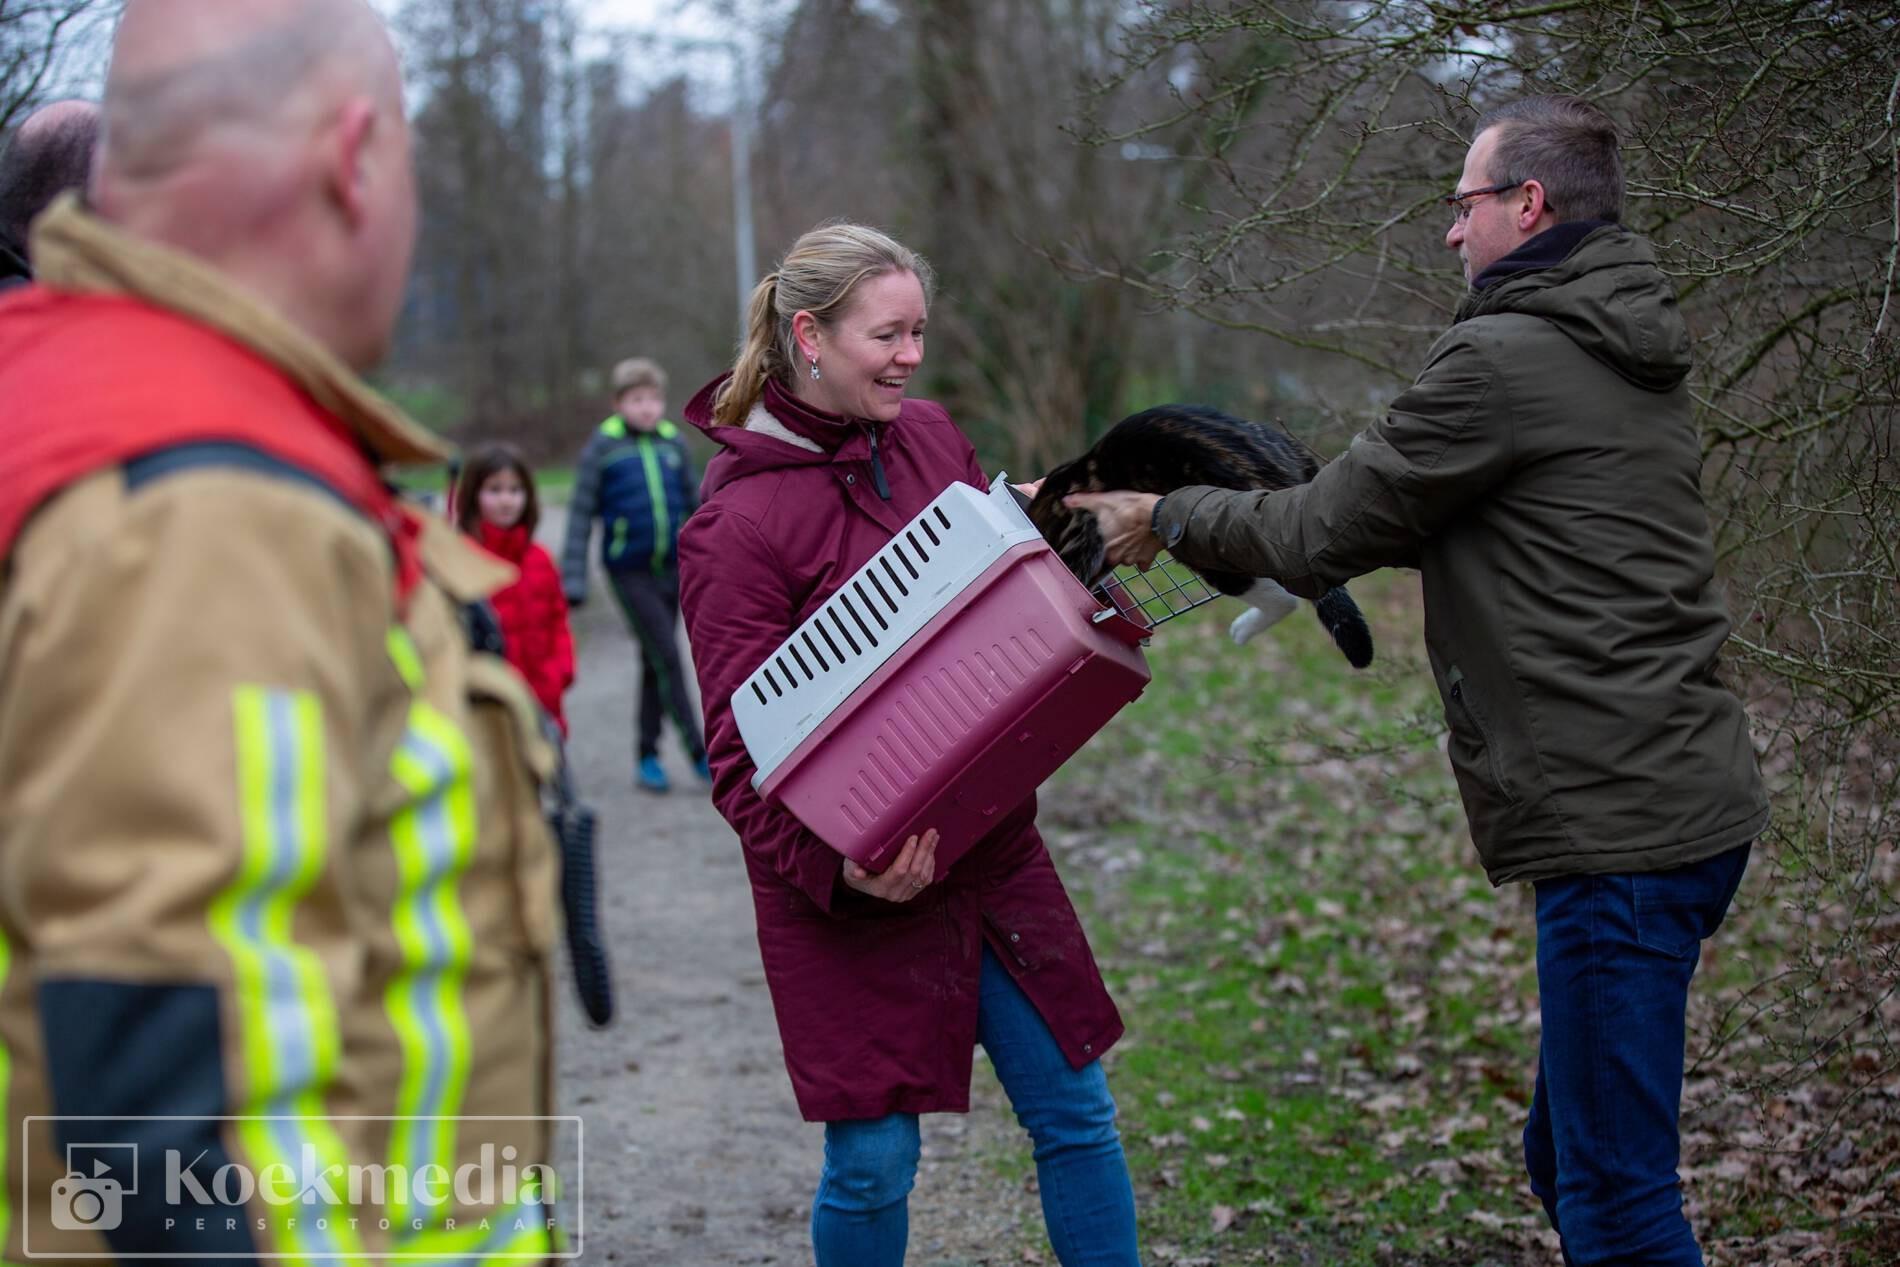 Brandweer redt kat uit boom in Maasland